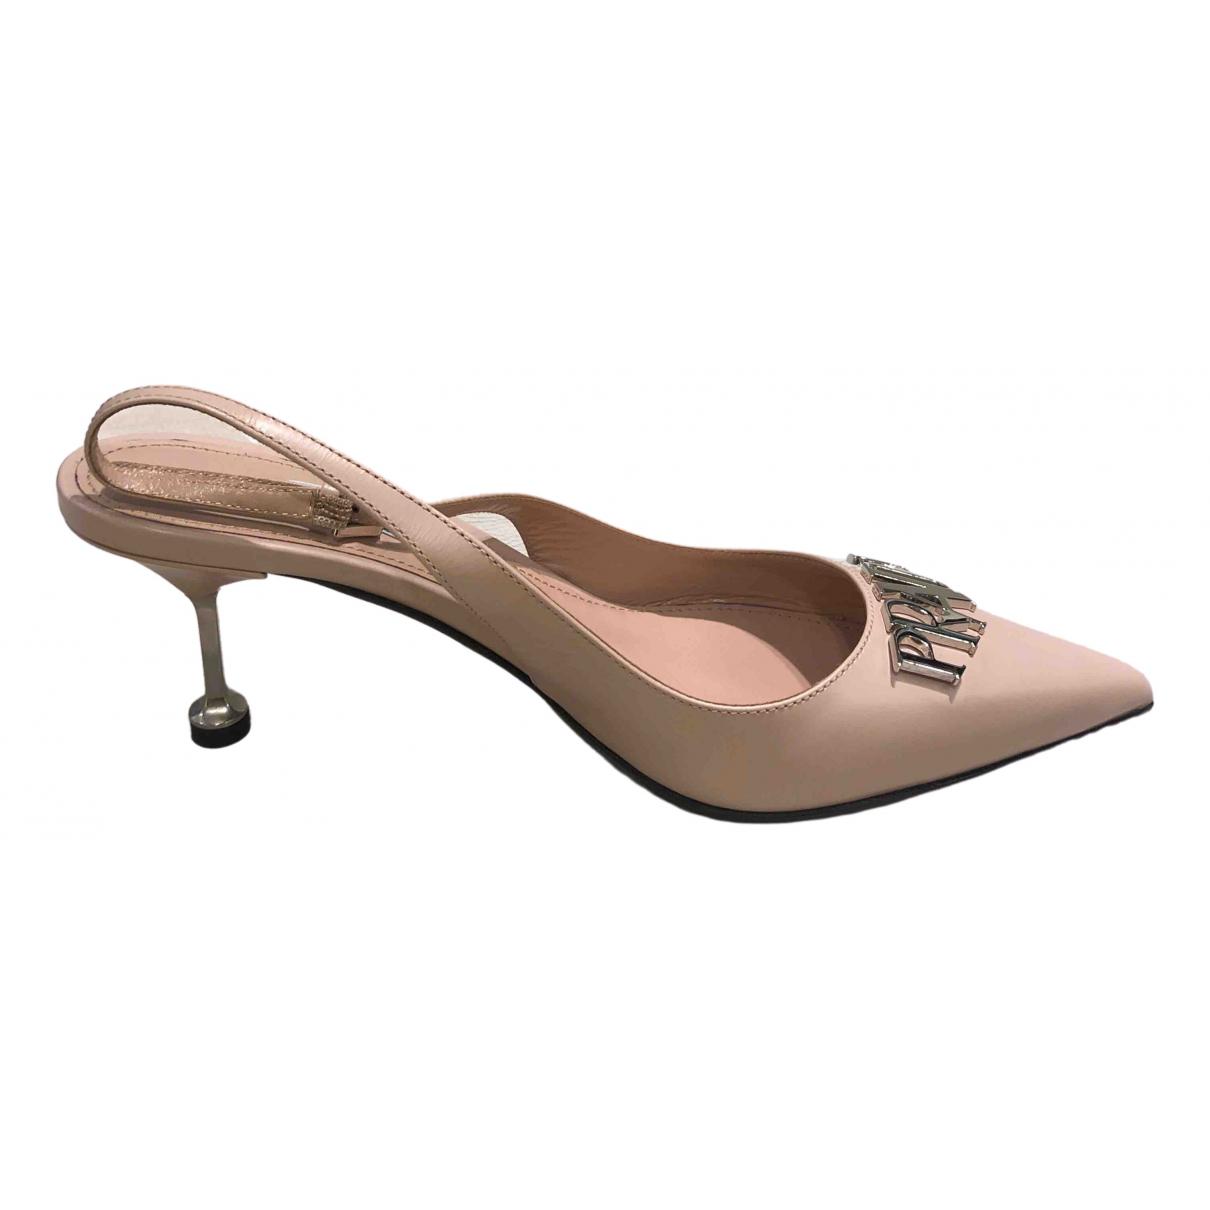 Prada \N Pink Leather Espadrilles for Women 38 EU